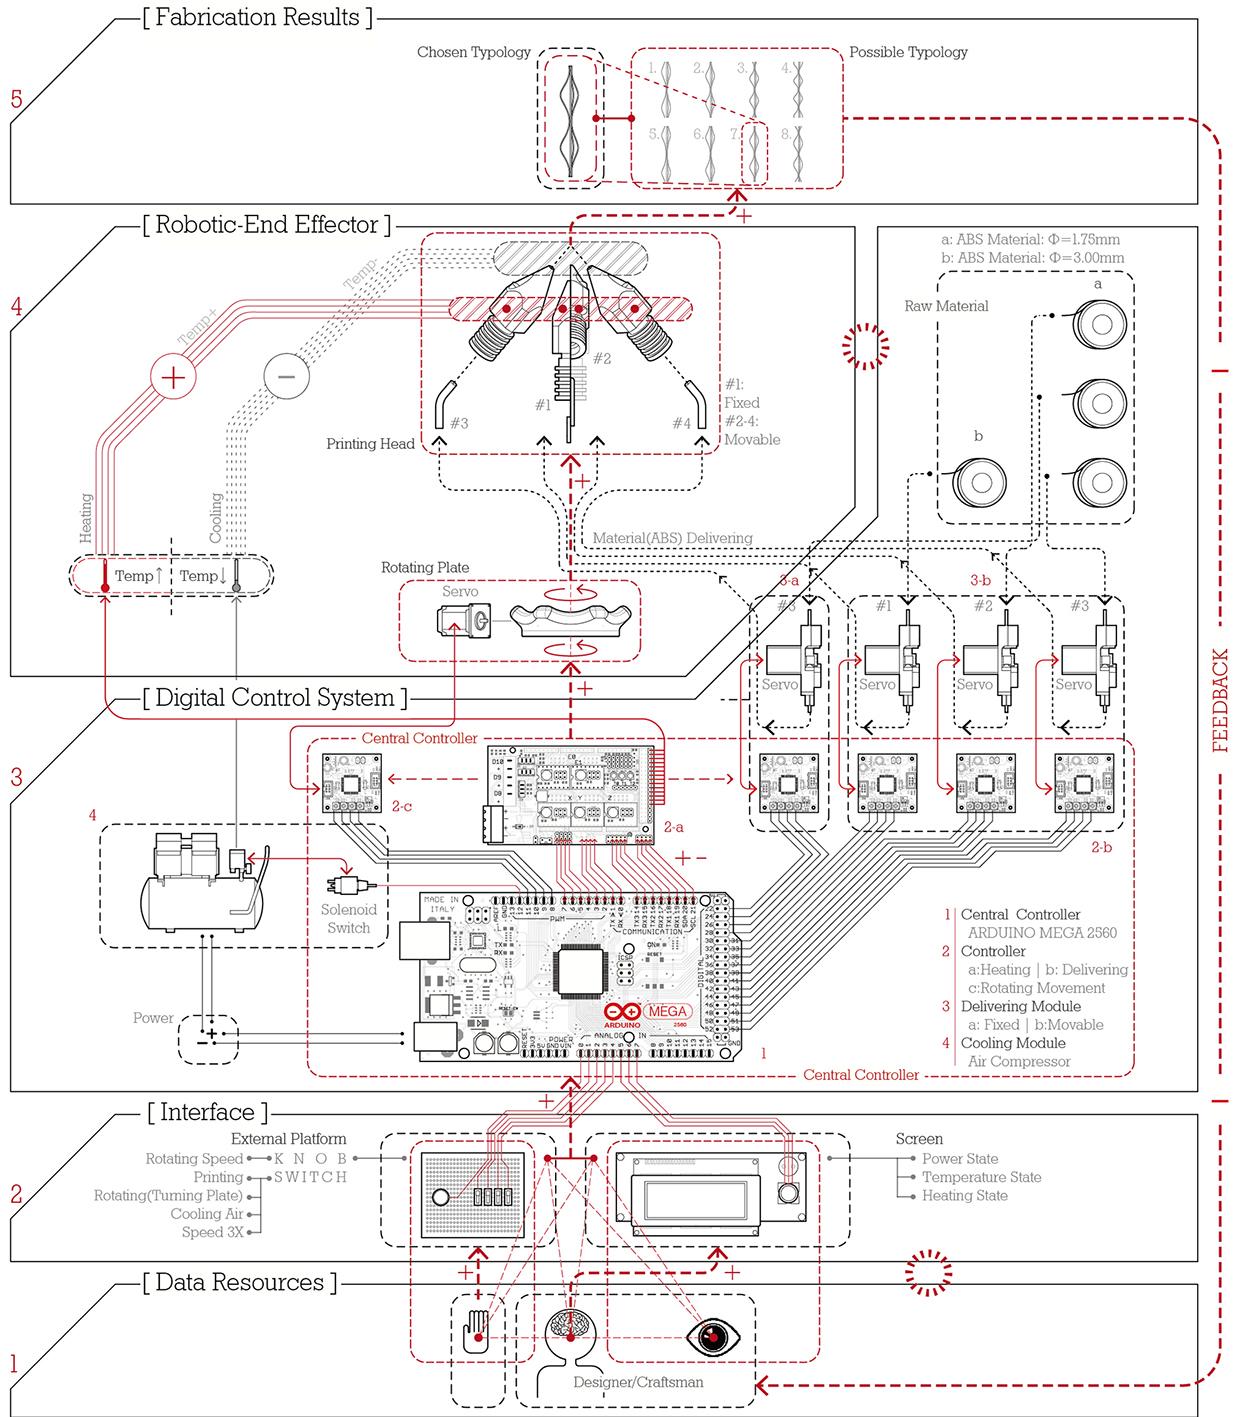 6-Axis Robot-Arm 3D Printer Runs on Arduino, Slings